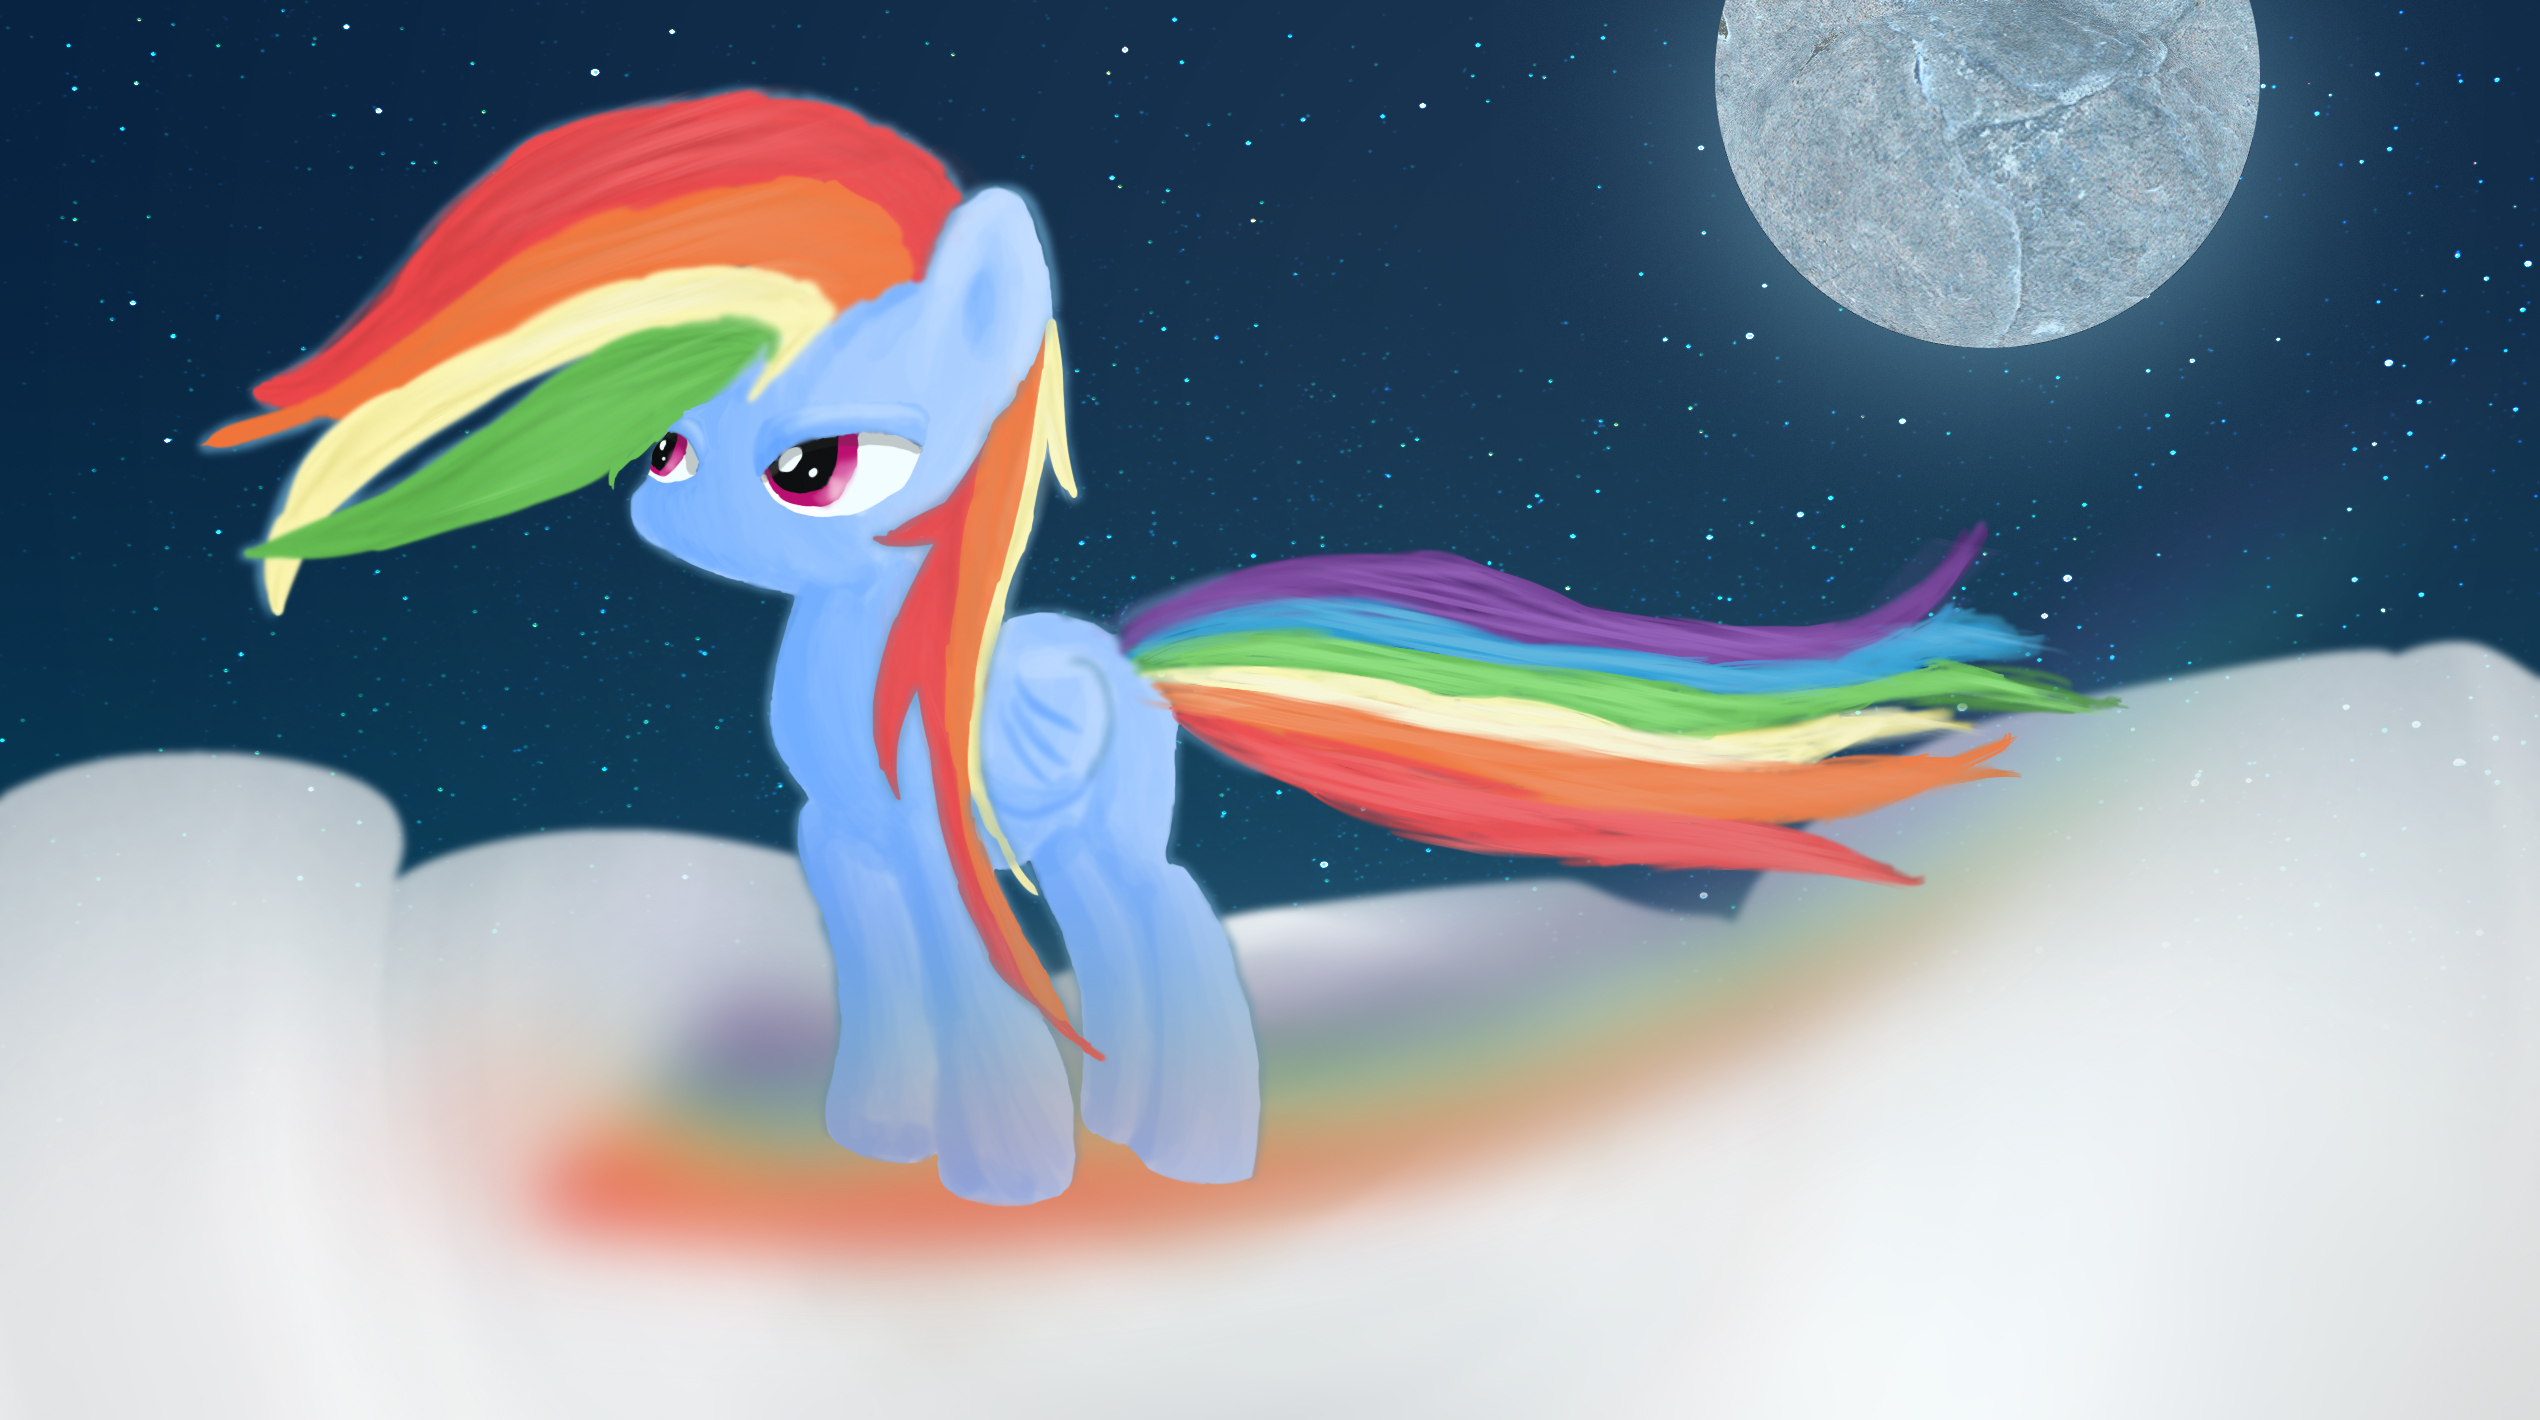 My first digital paining - Rainbow Dash